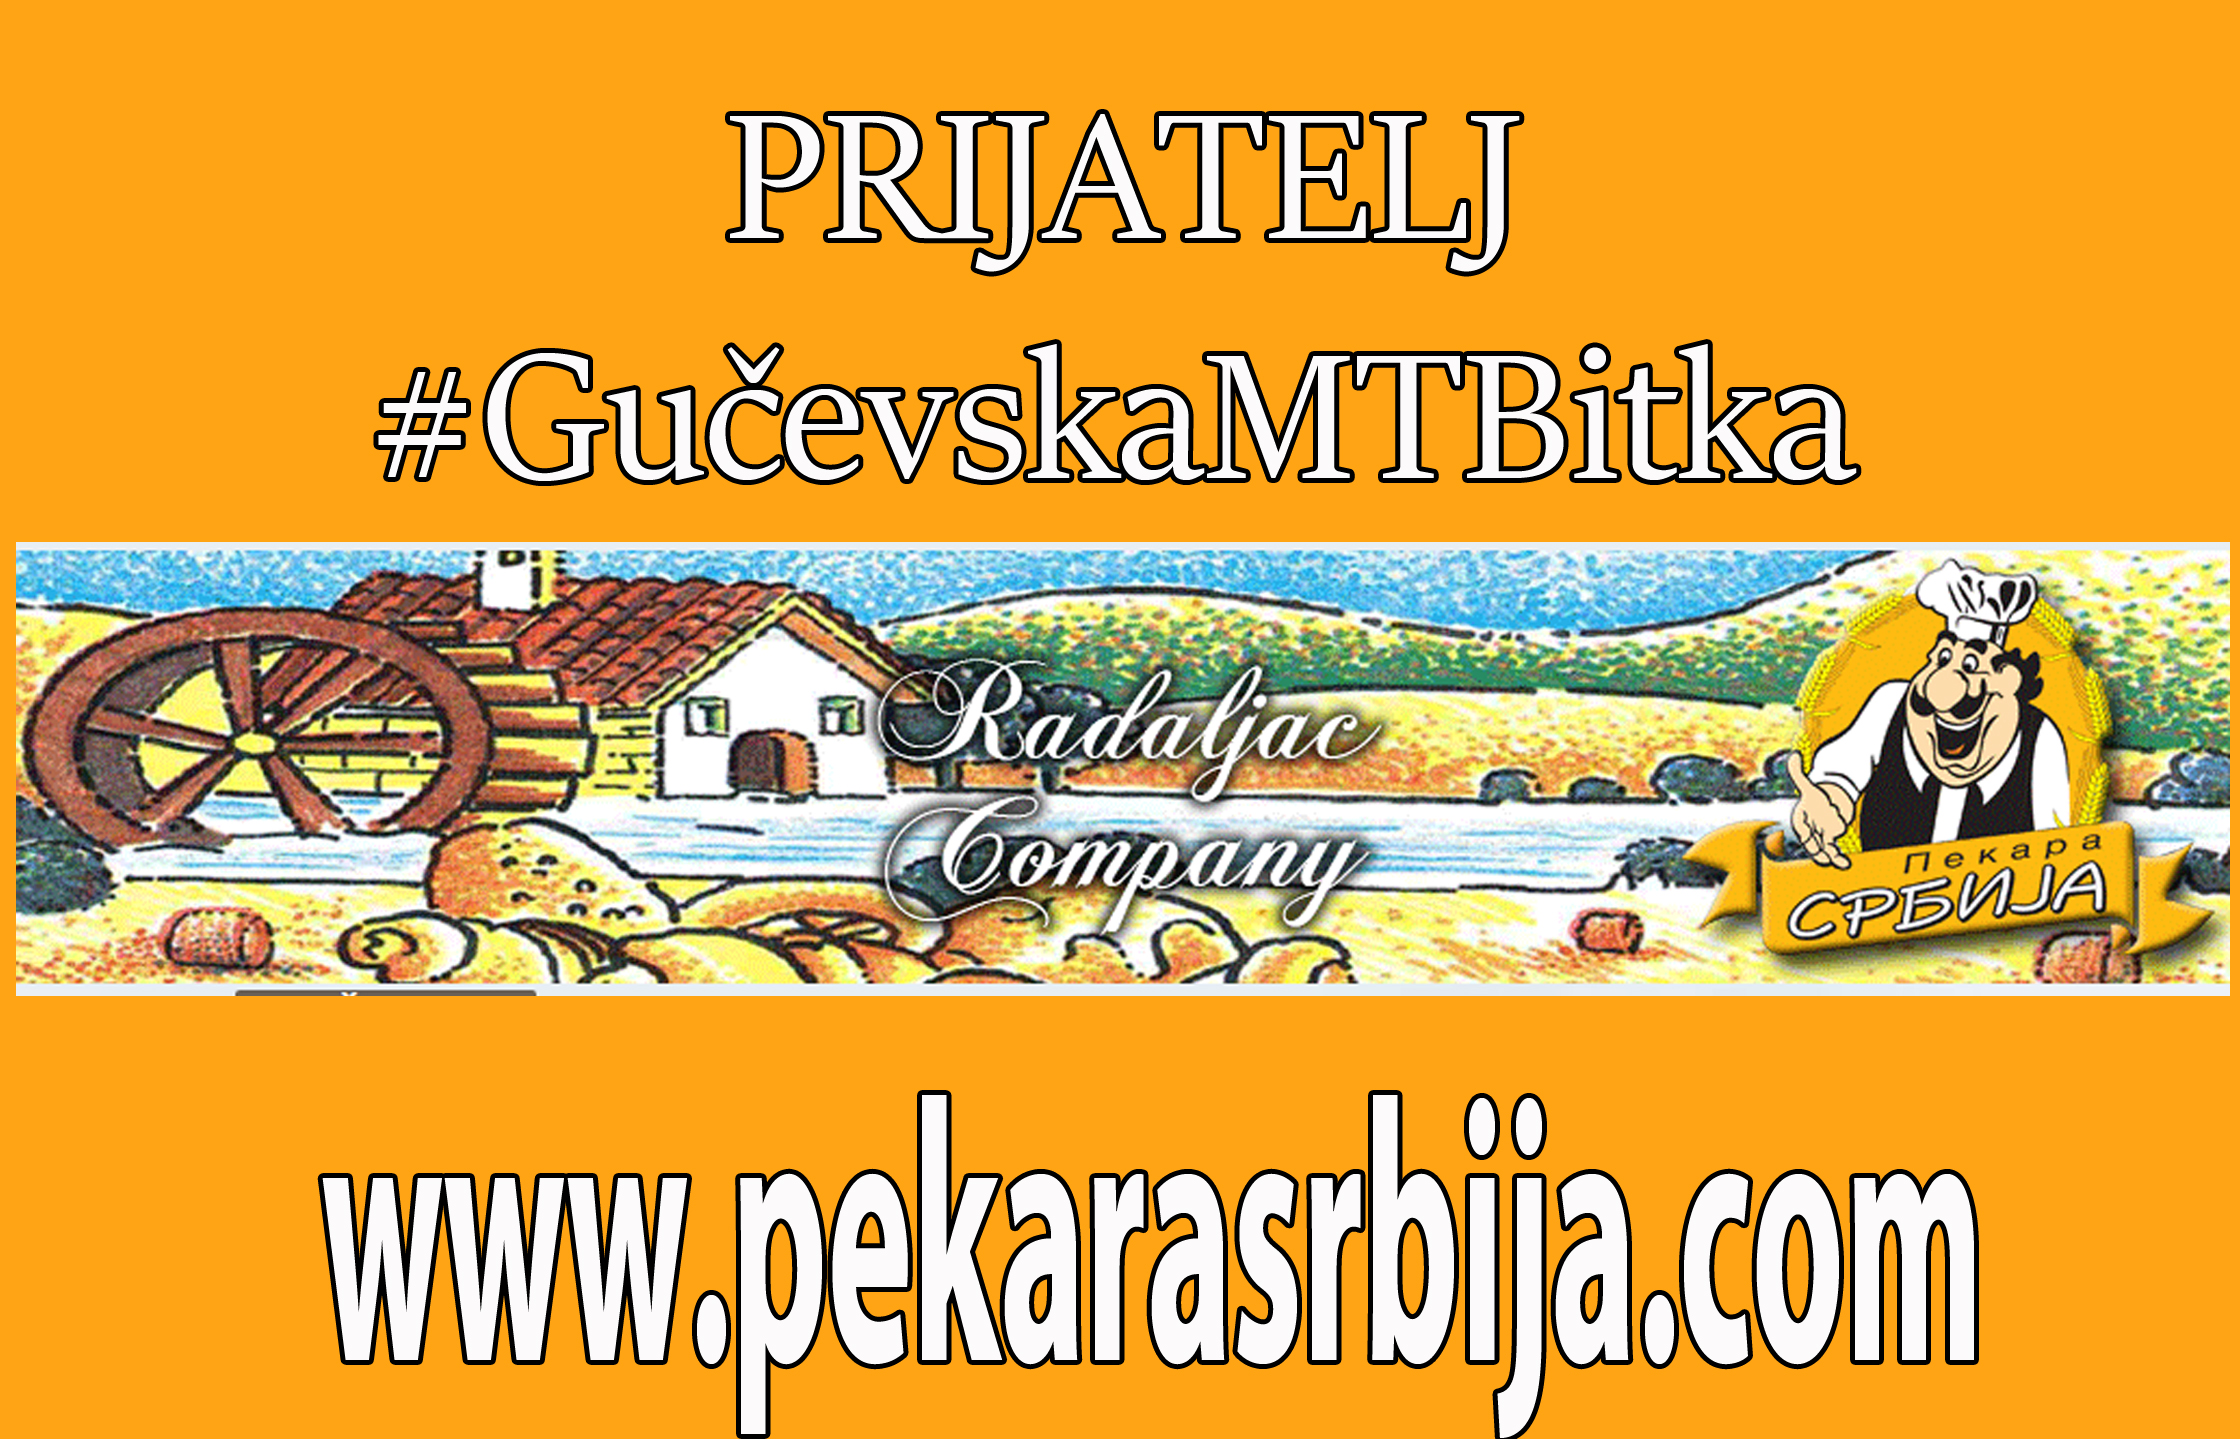 Pekara Srbija